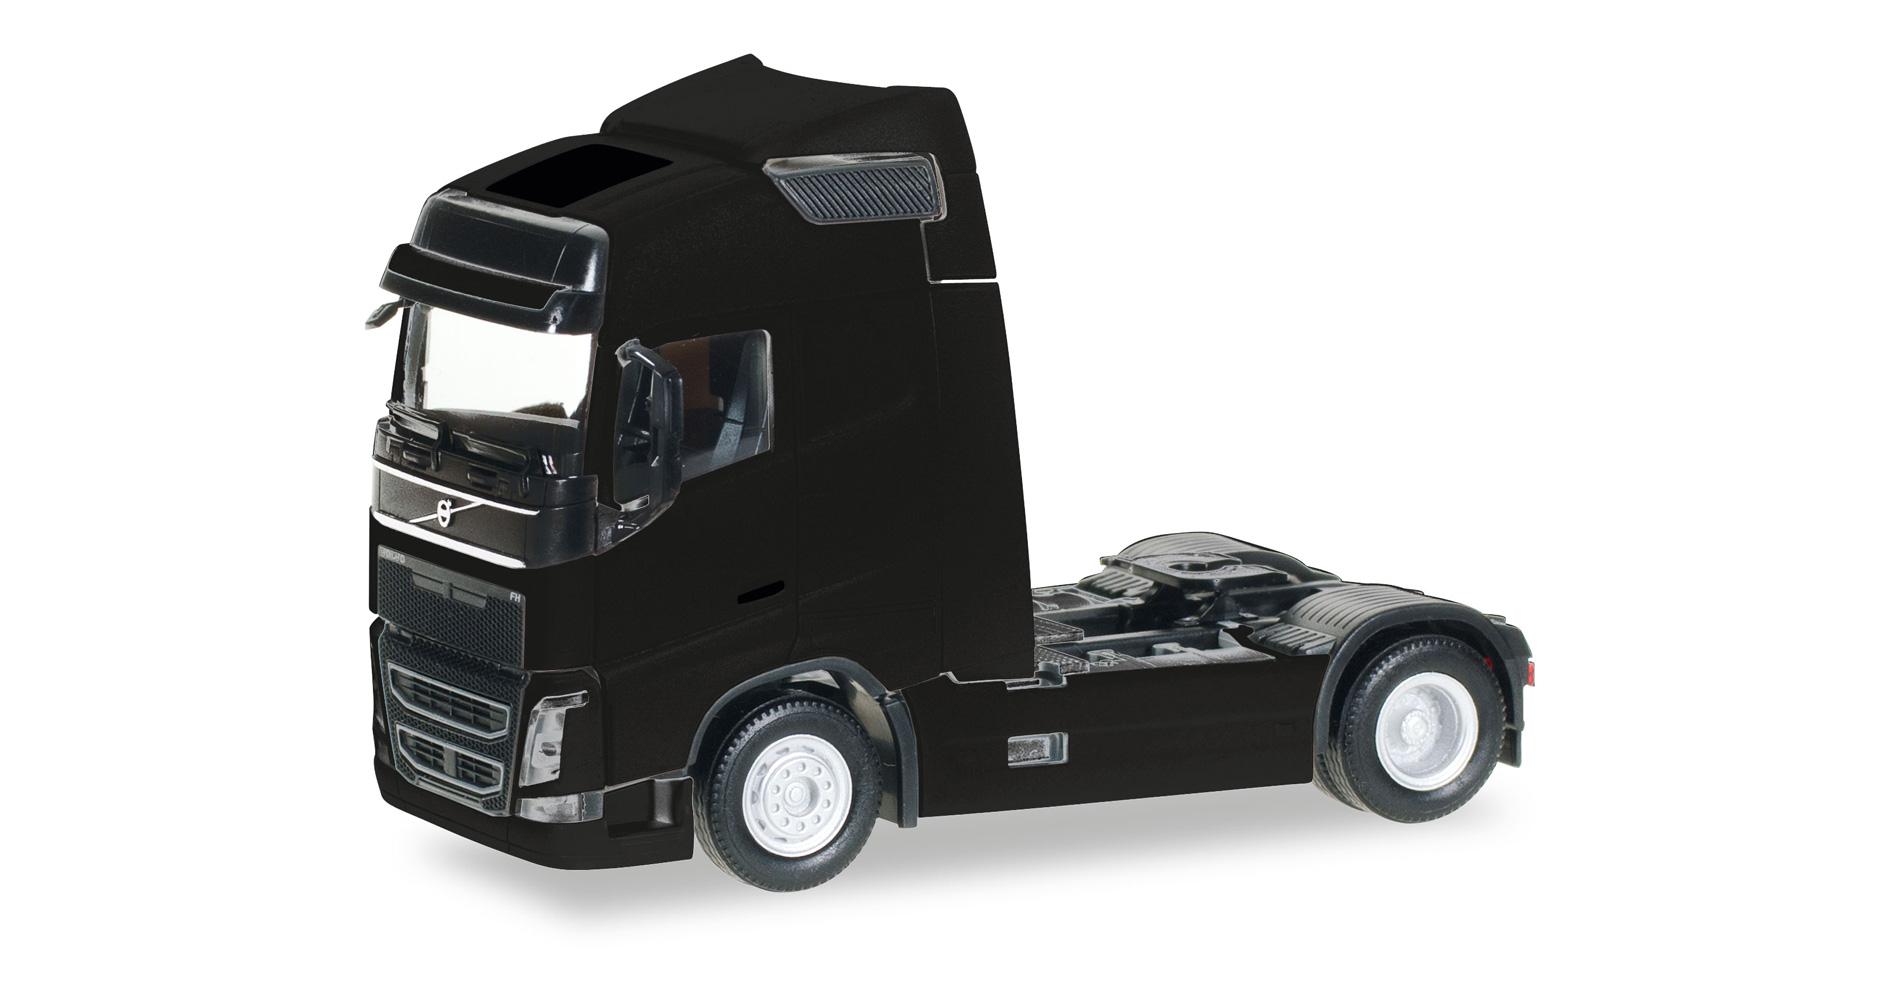 Herpa 303767 004 Volvo FH GL Globetrotter tractor camión negro scale 1 87 nuevo